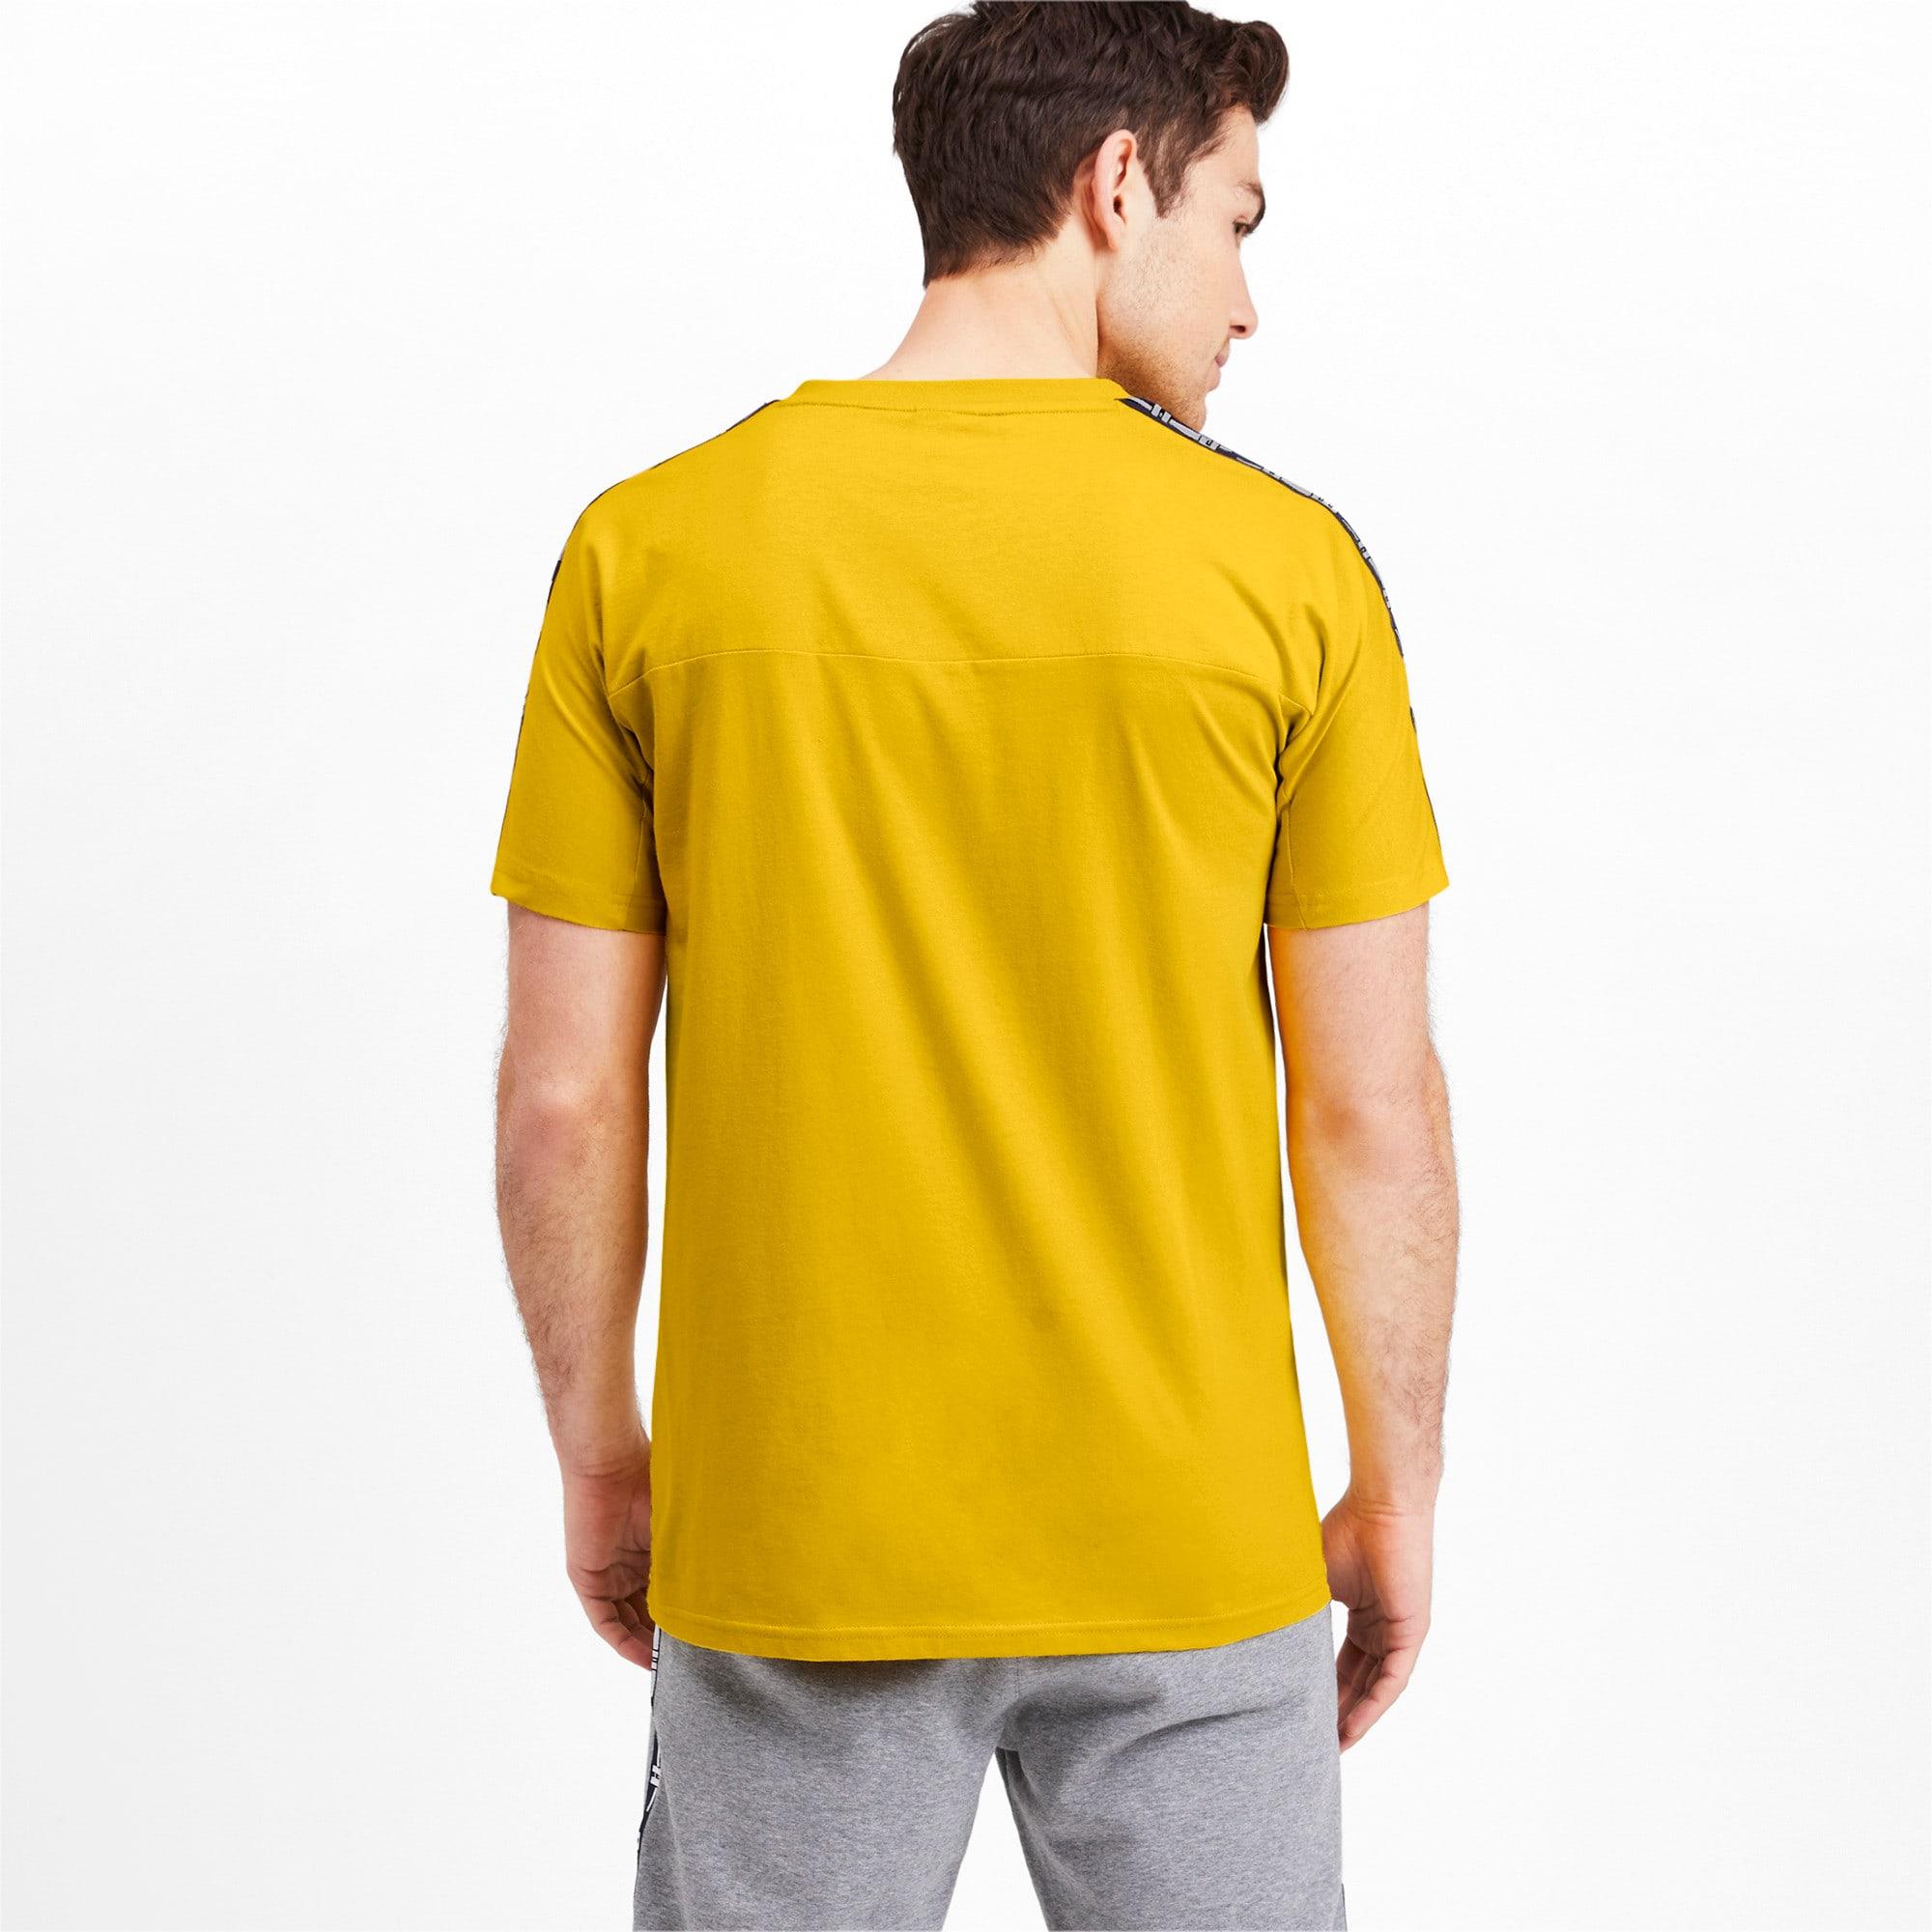 Thumbnail 3 of PUMA XTG SS Tシャツ, Sulphur, medium-JPN